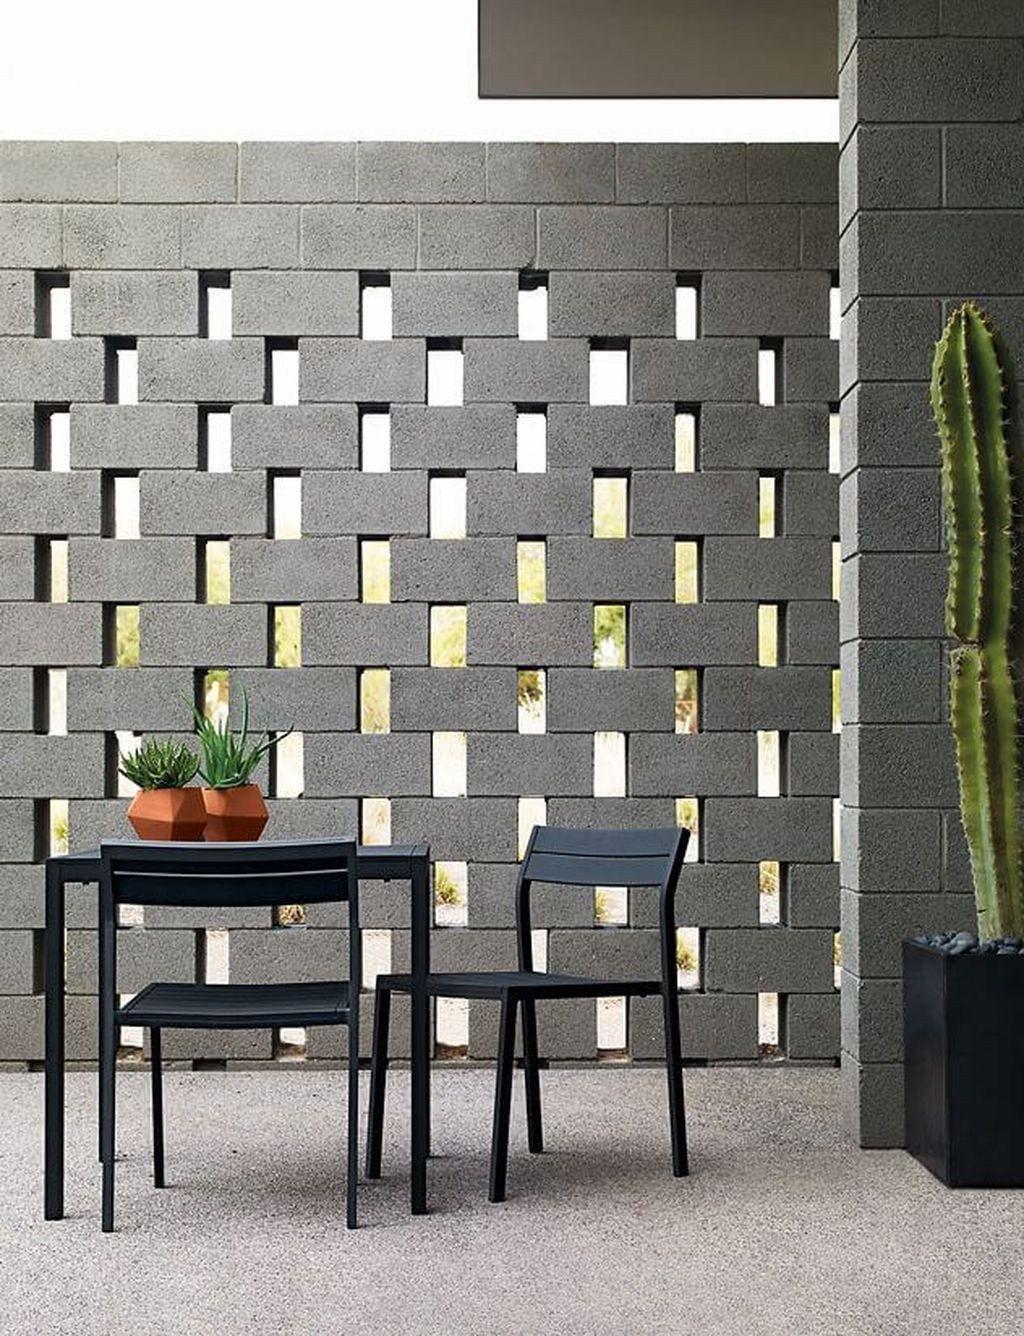 Creative Cinder Block Backyard Ideas On A Budget 57 Breeze Block Wall Brick Exterior House Cinder Block Walls